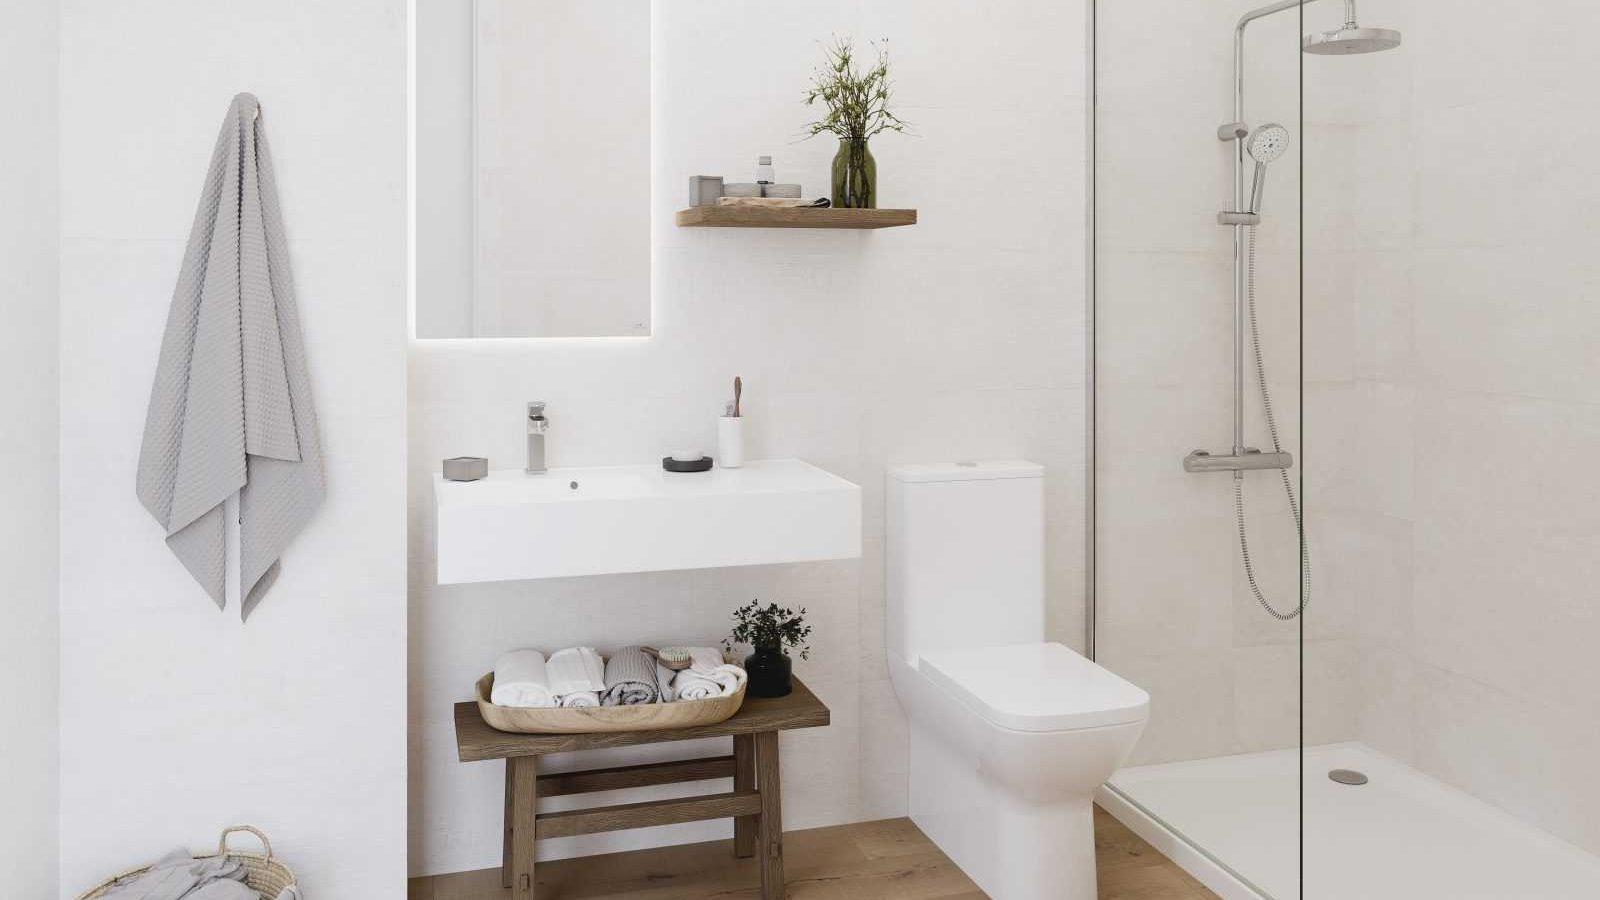 Bath A Vancouver Brown Newport White